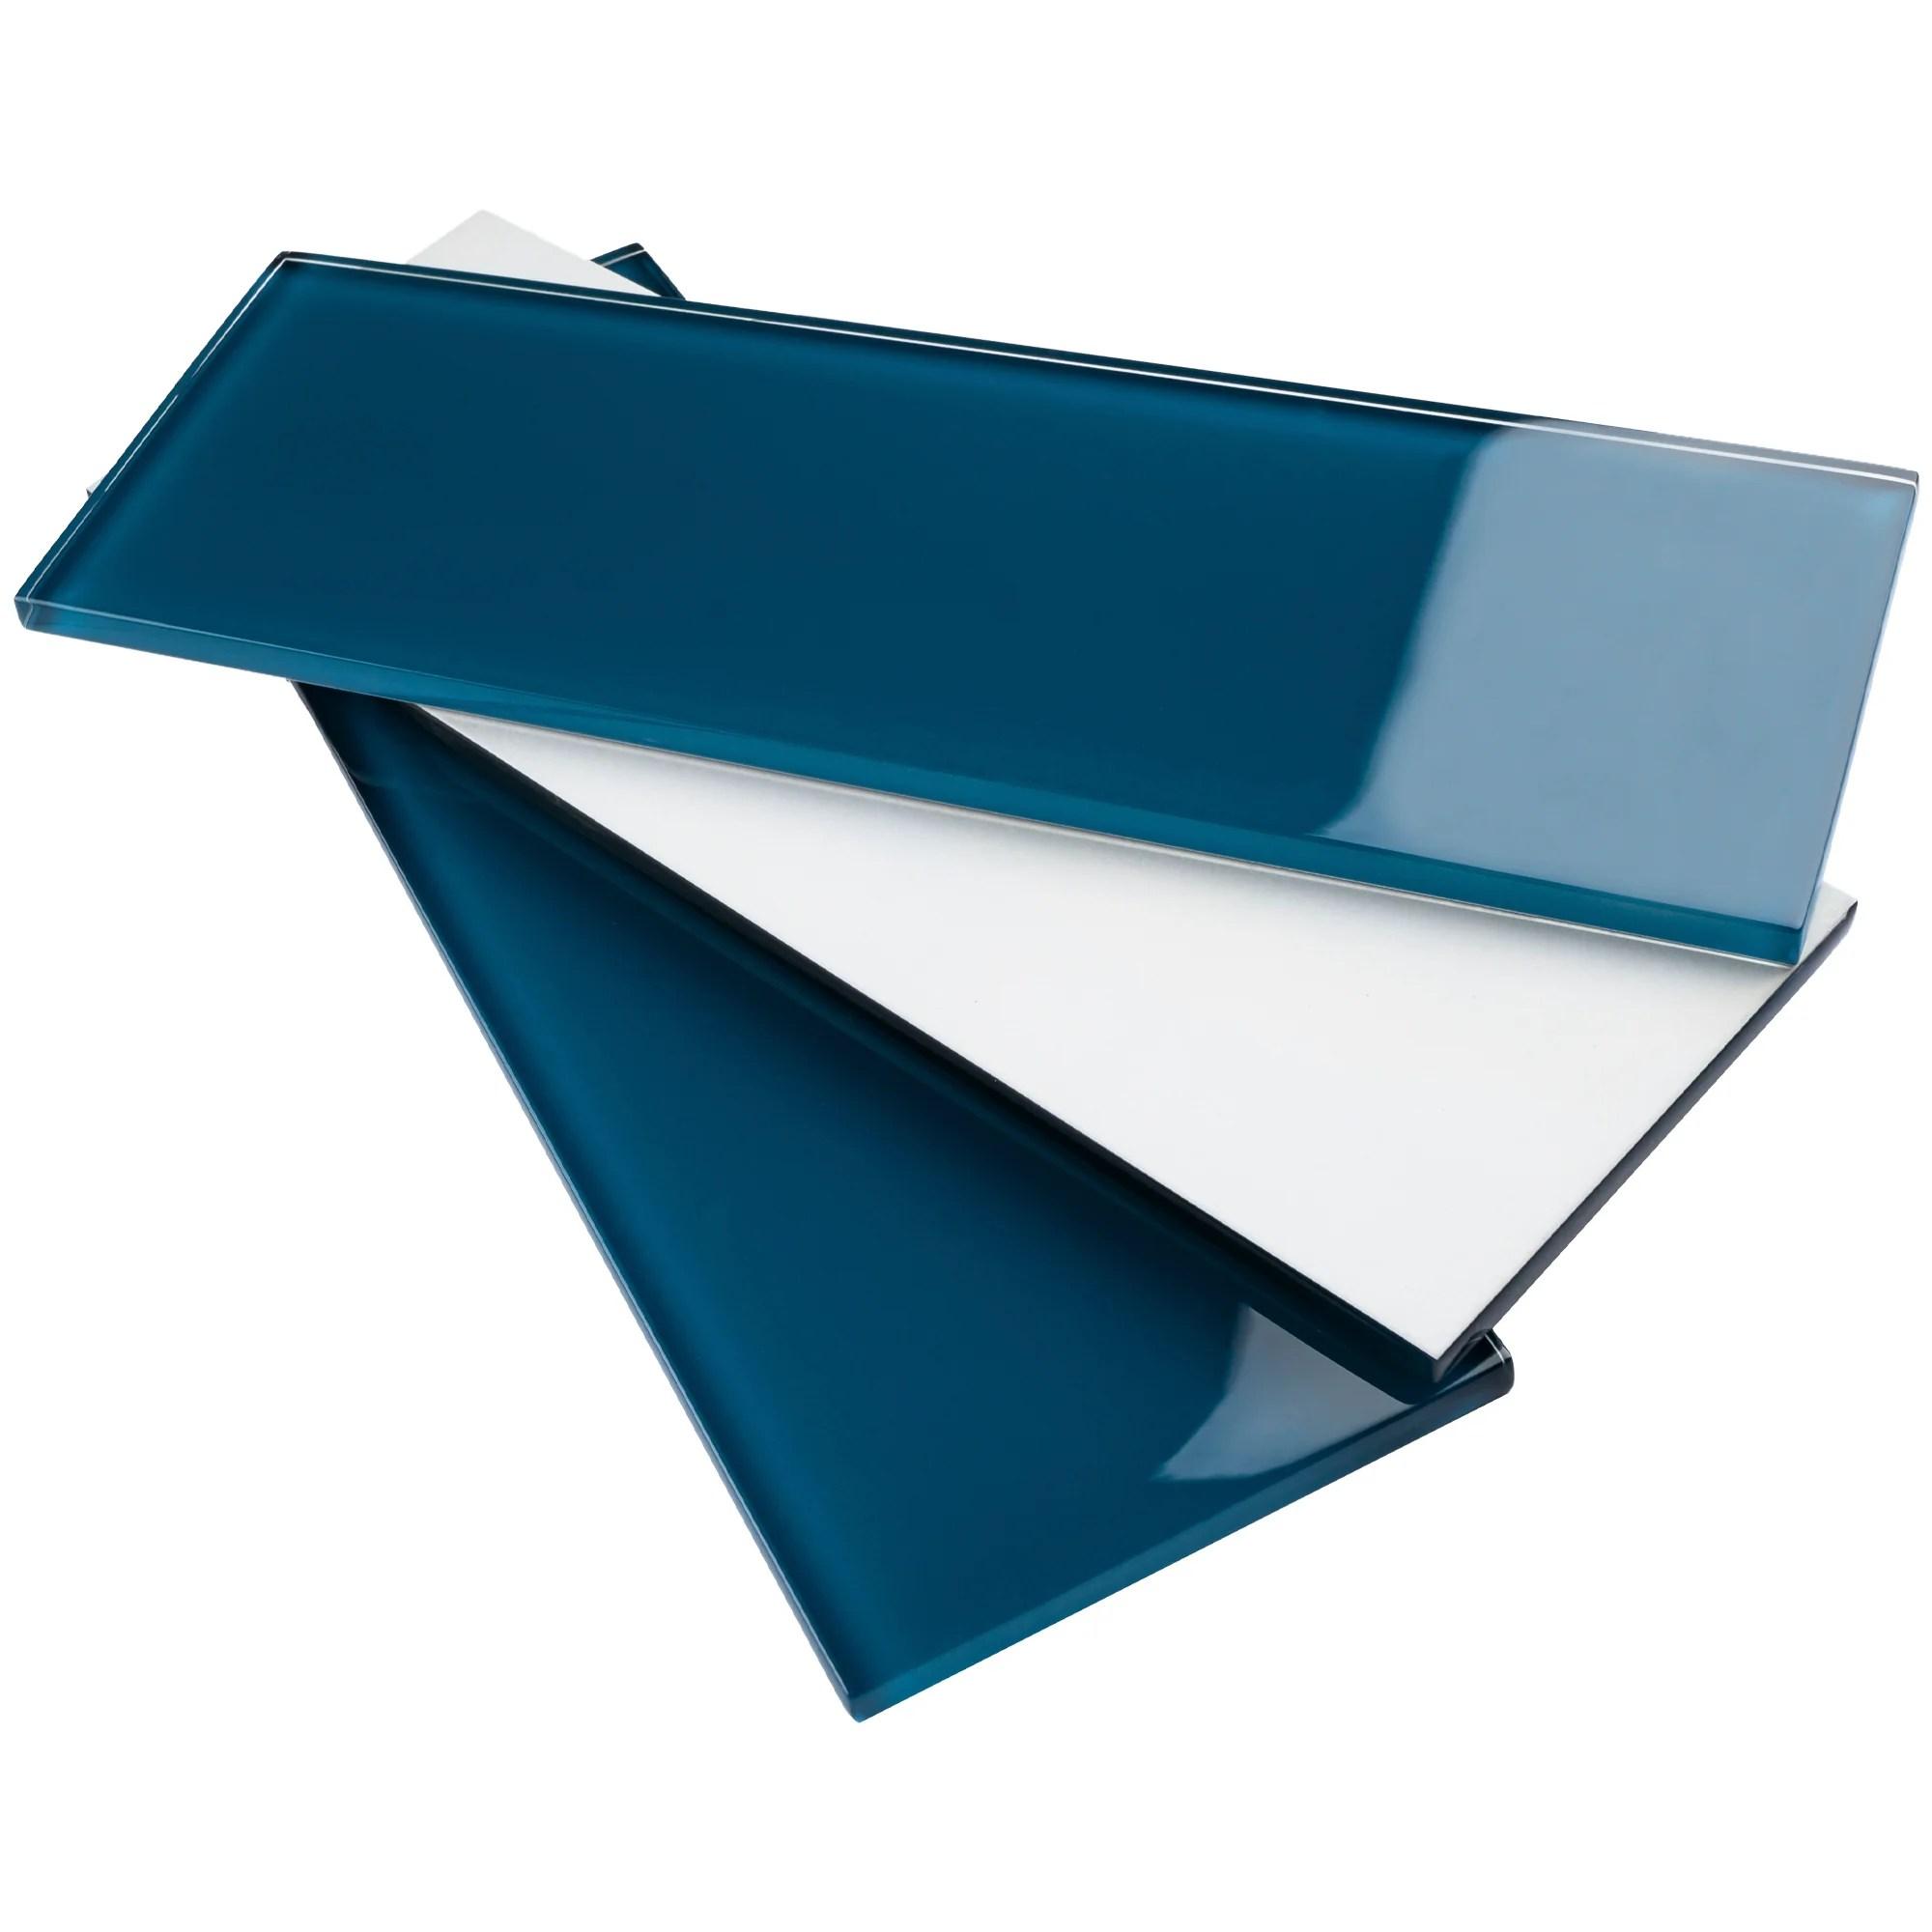 tcsbg 15 turquoise blue 4x12 glass